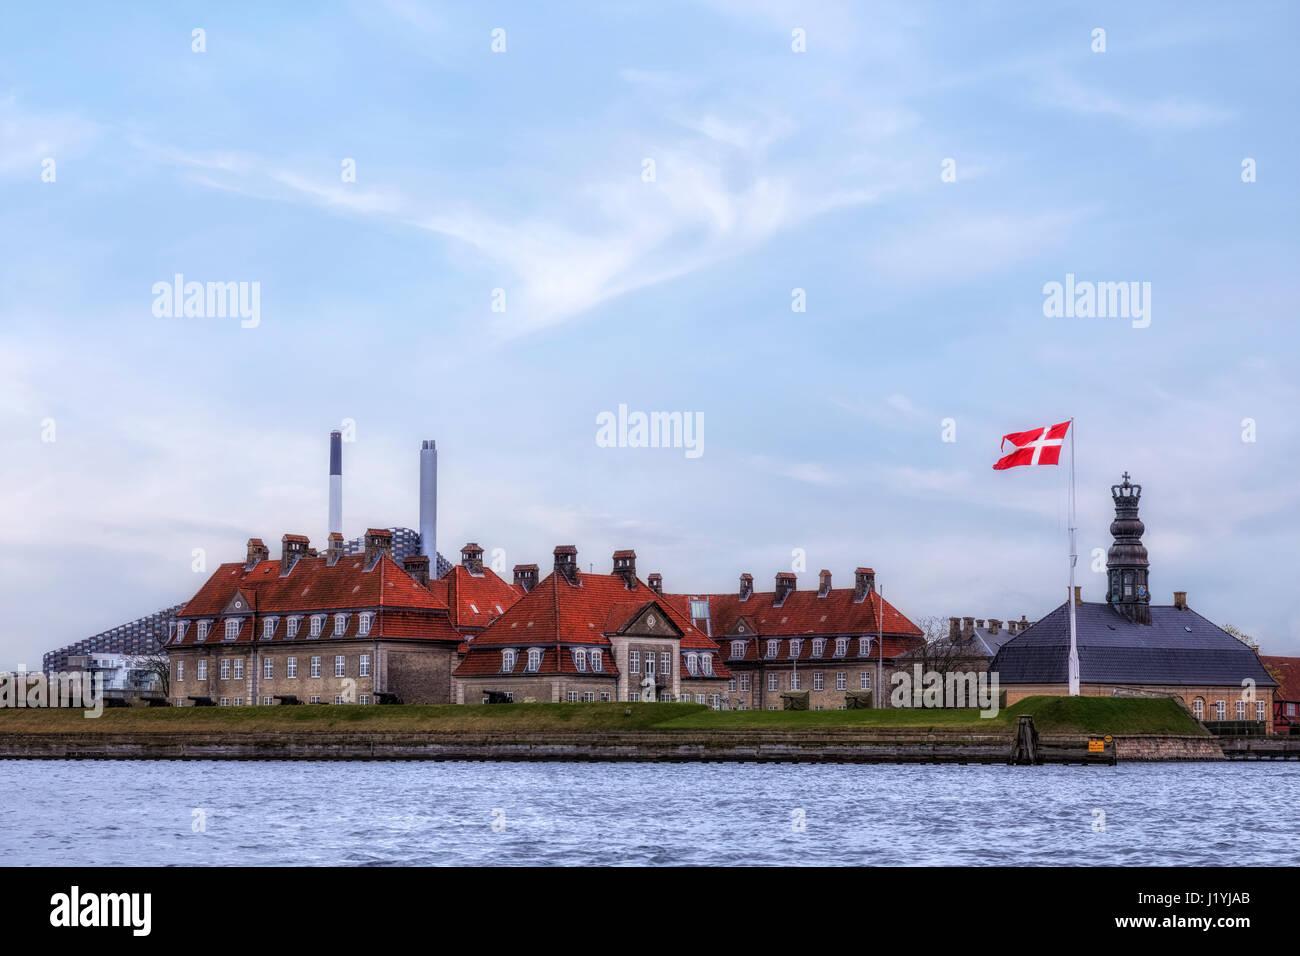 Nyholm, Copenhagen, Denmark, Scandinavia - Stock-Bilder